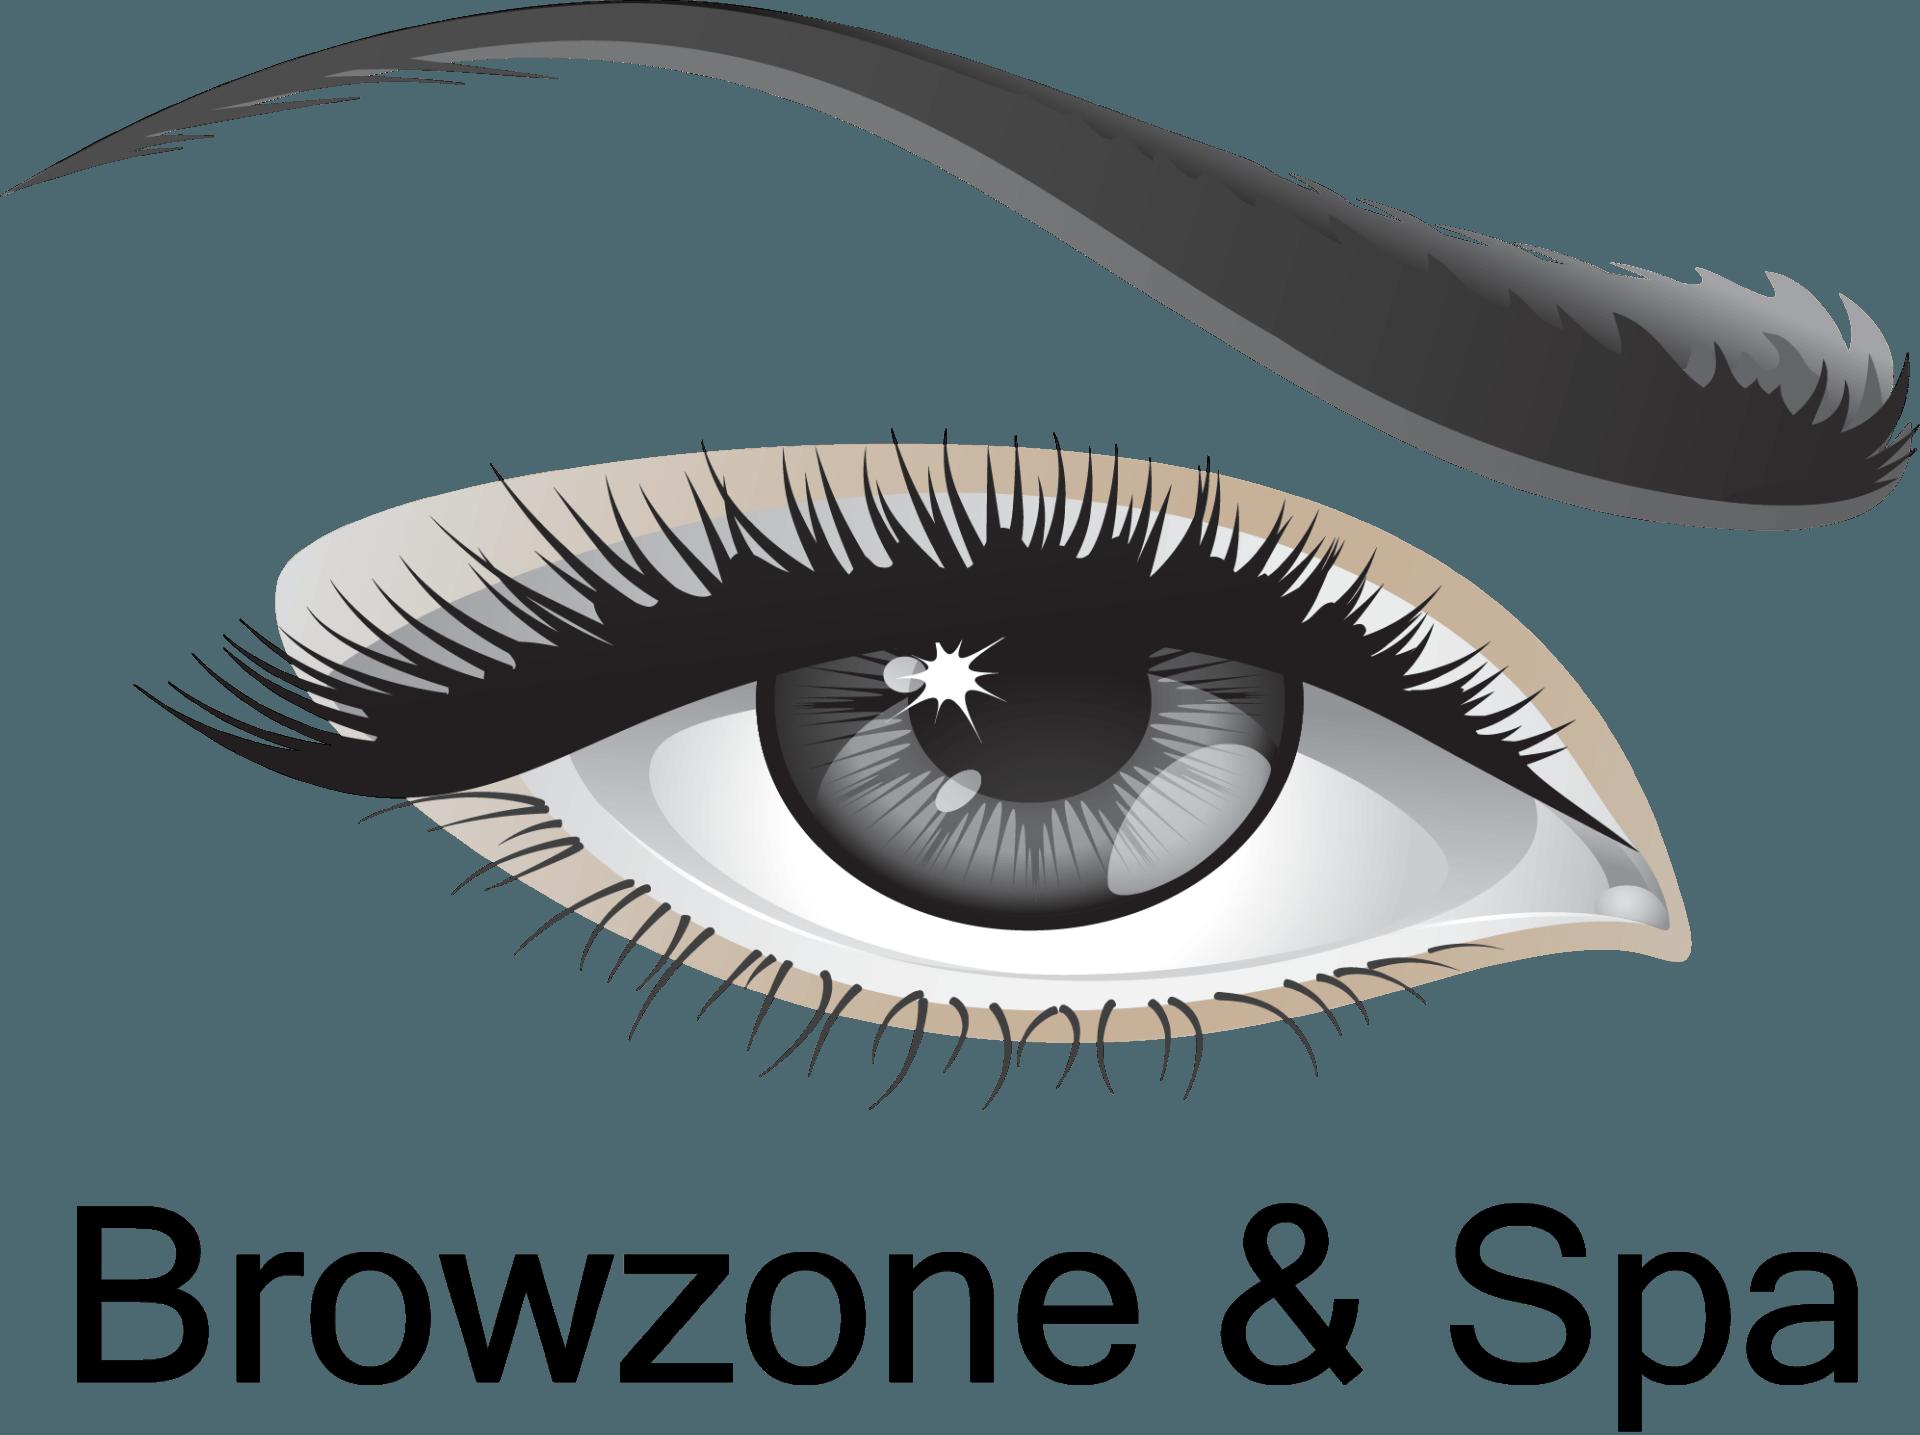 Eyebrow Threading, Bikini Wa,-Facial & Henna Tattoos   Brow Zone & Spa